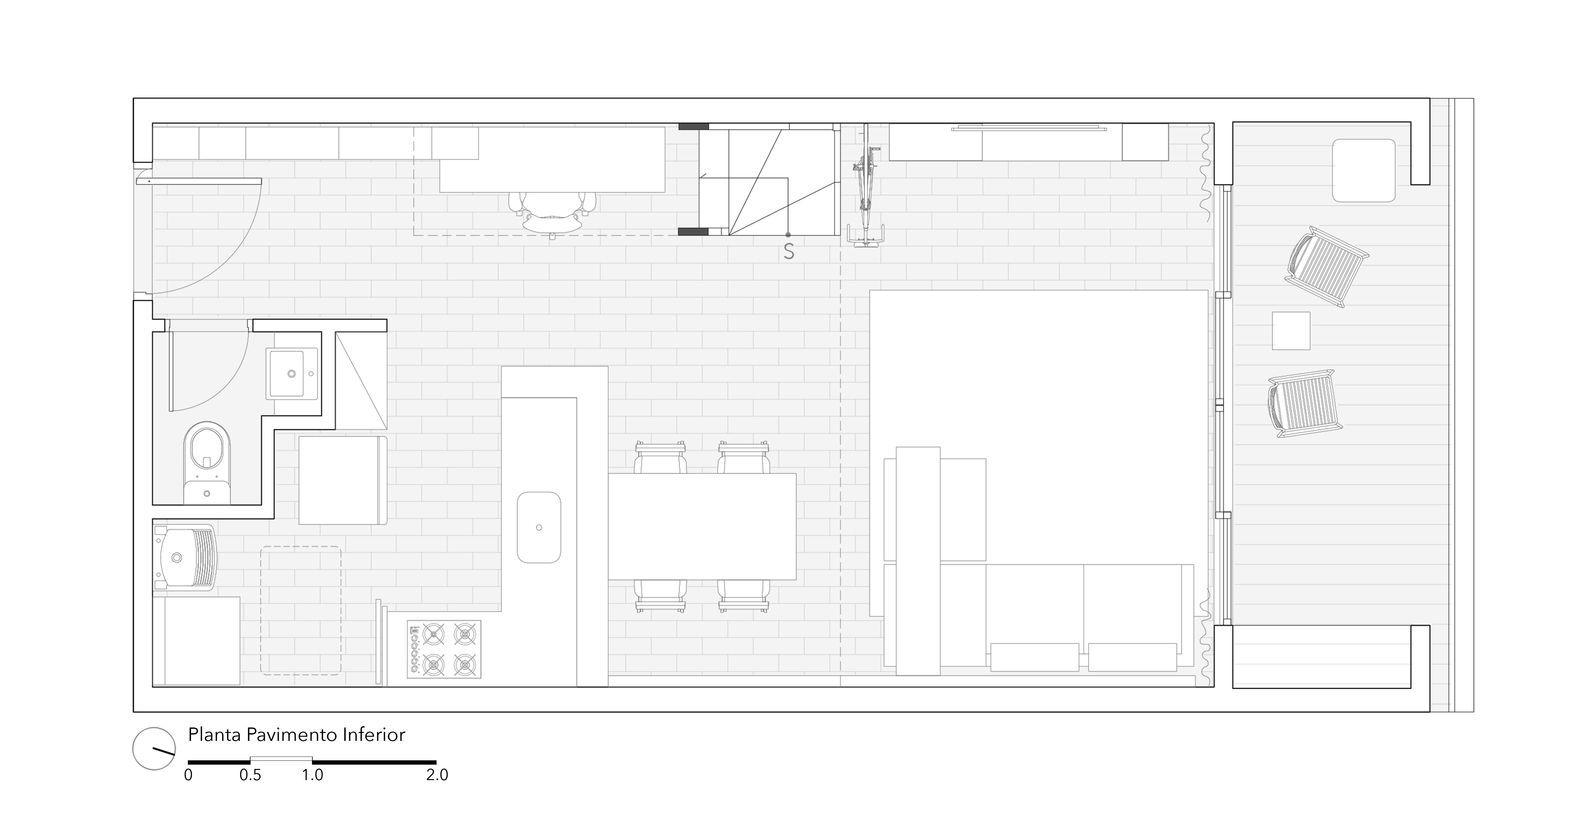 Mezzanine Floor Meaning